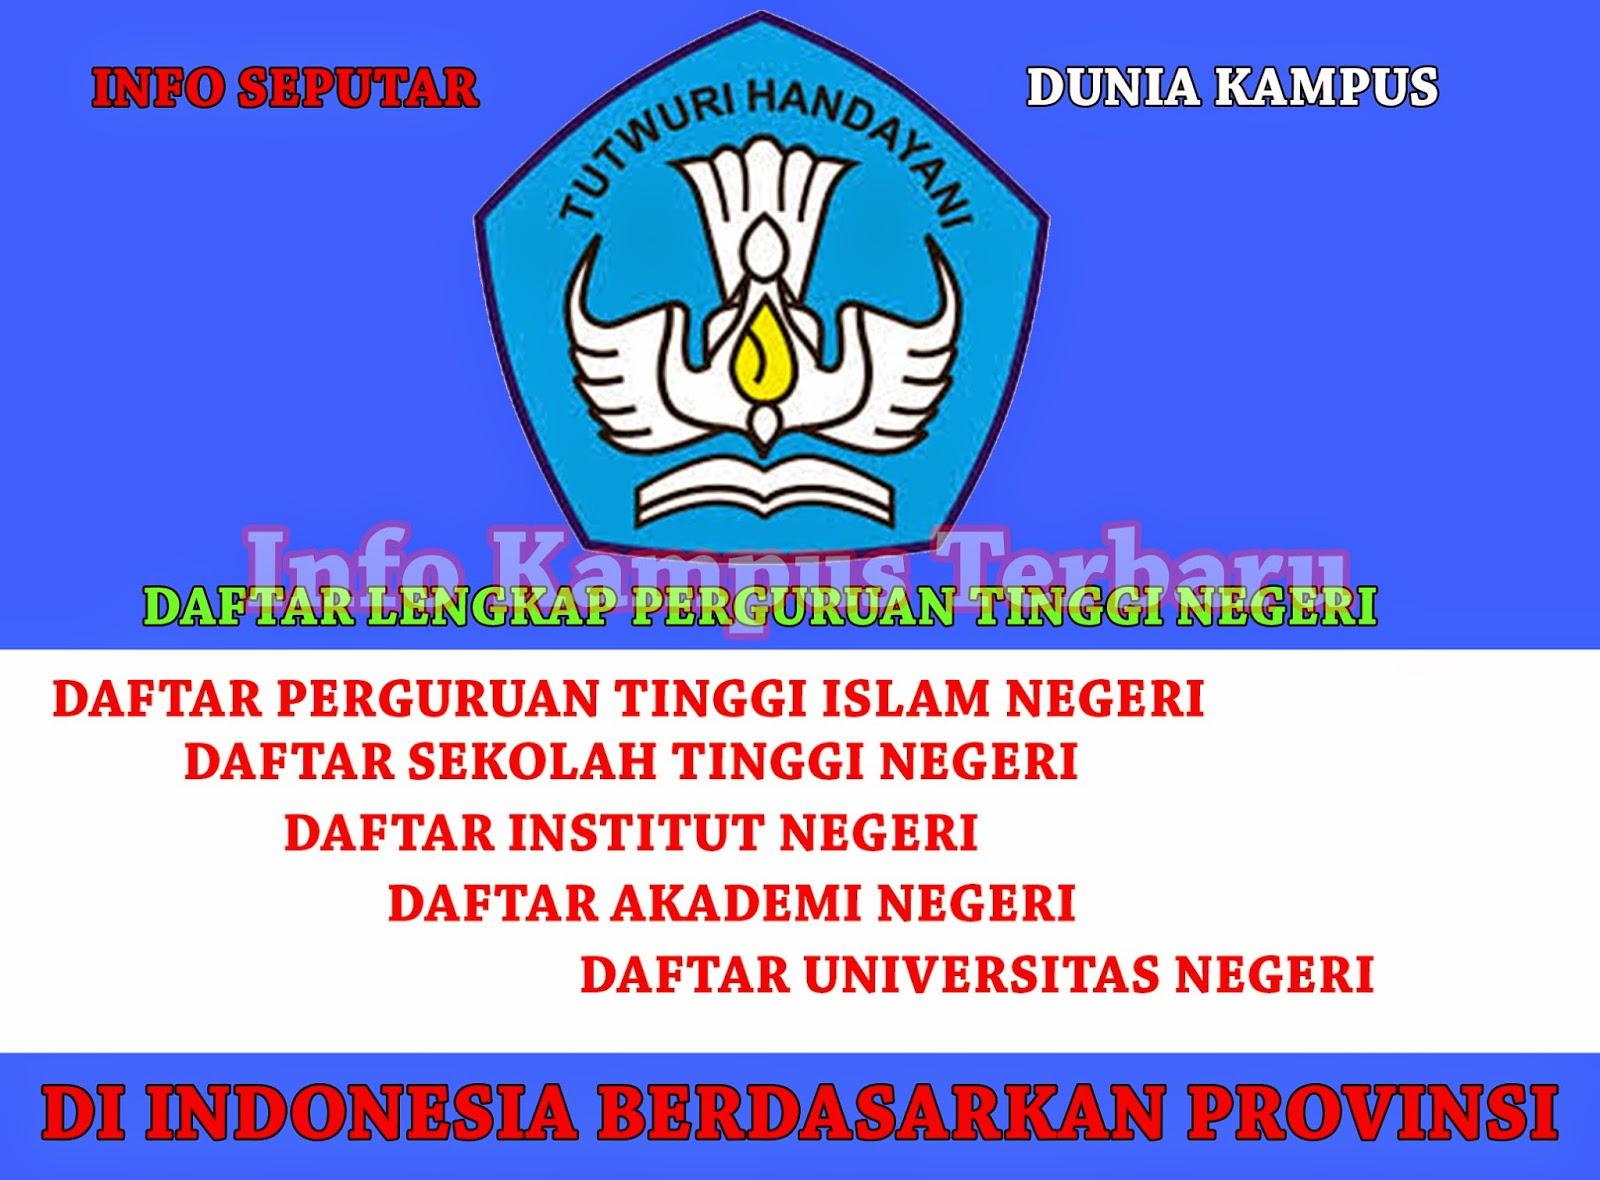 Daftar Lengkap Perguruan Tinggi Negeri di Indonesia